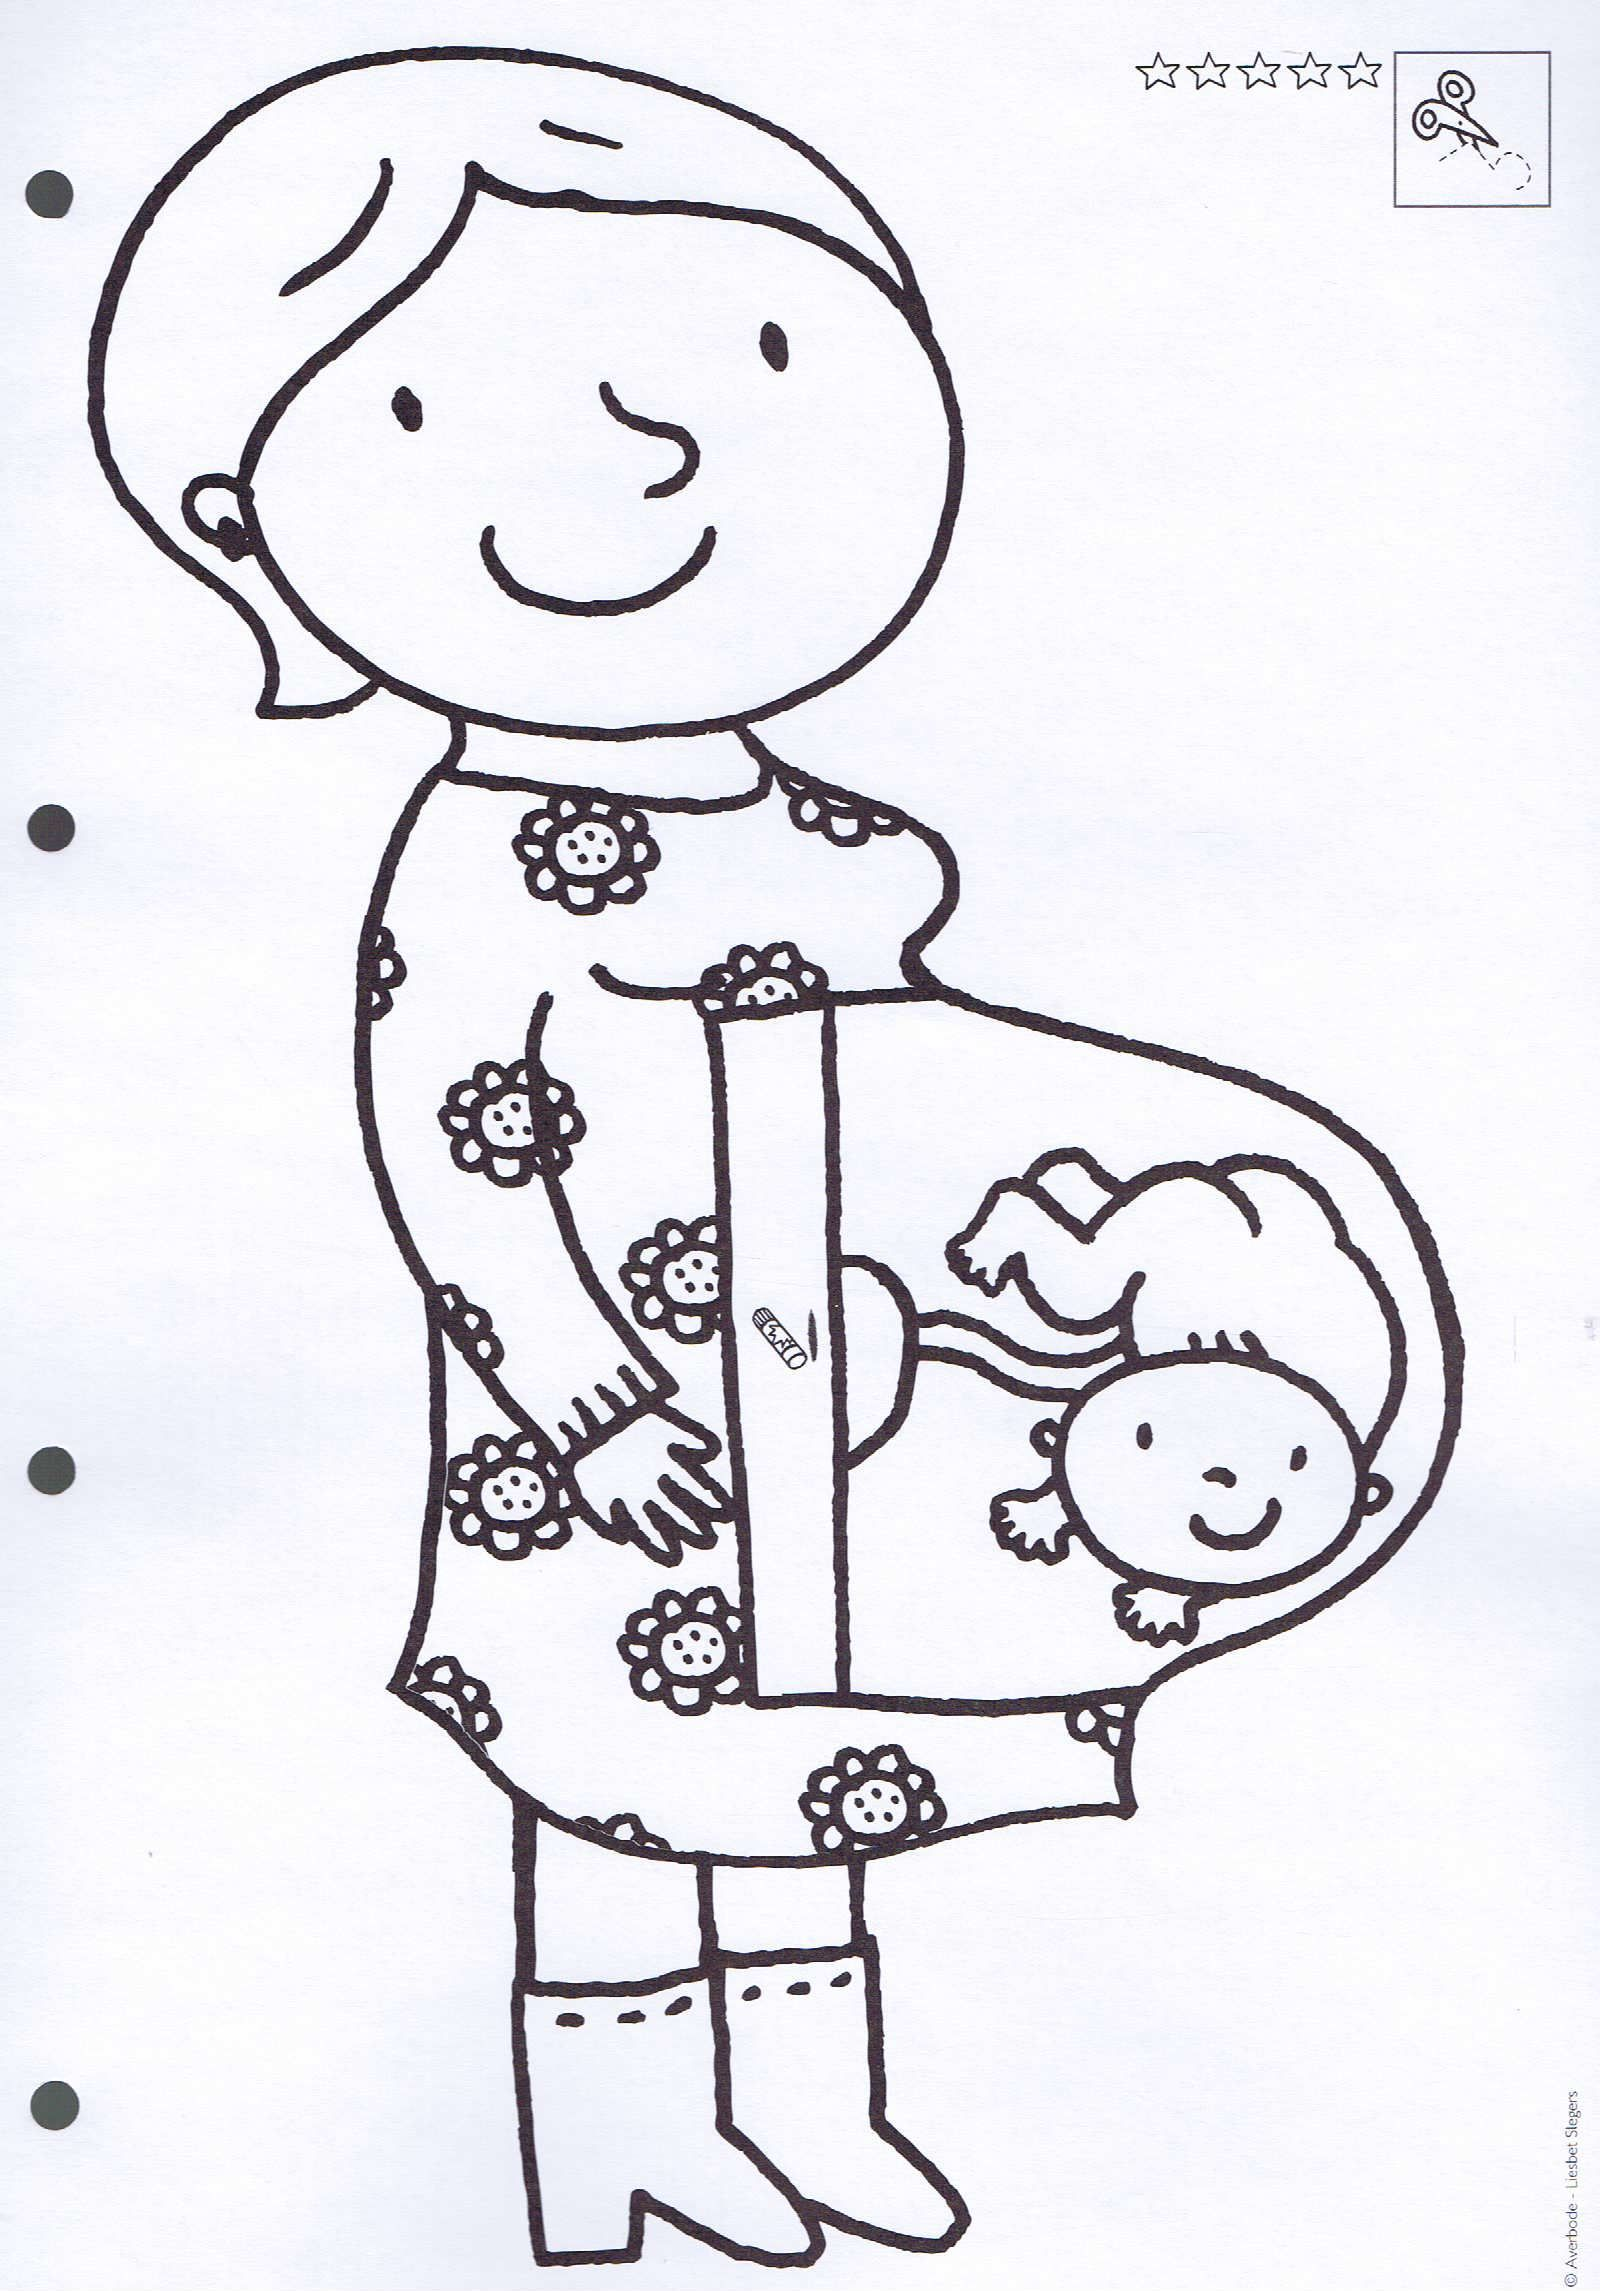 pin marleen everaert op familie knutselen thema baby